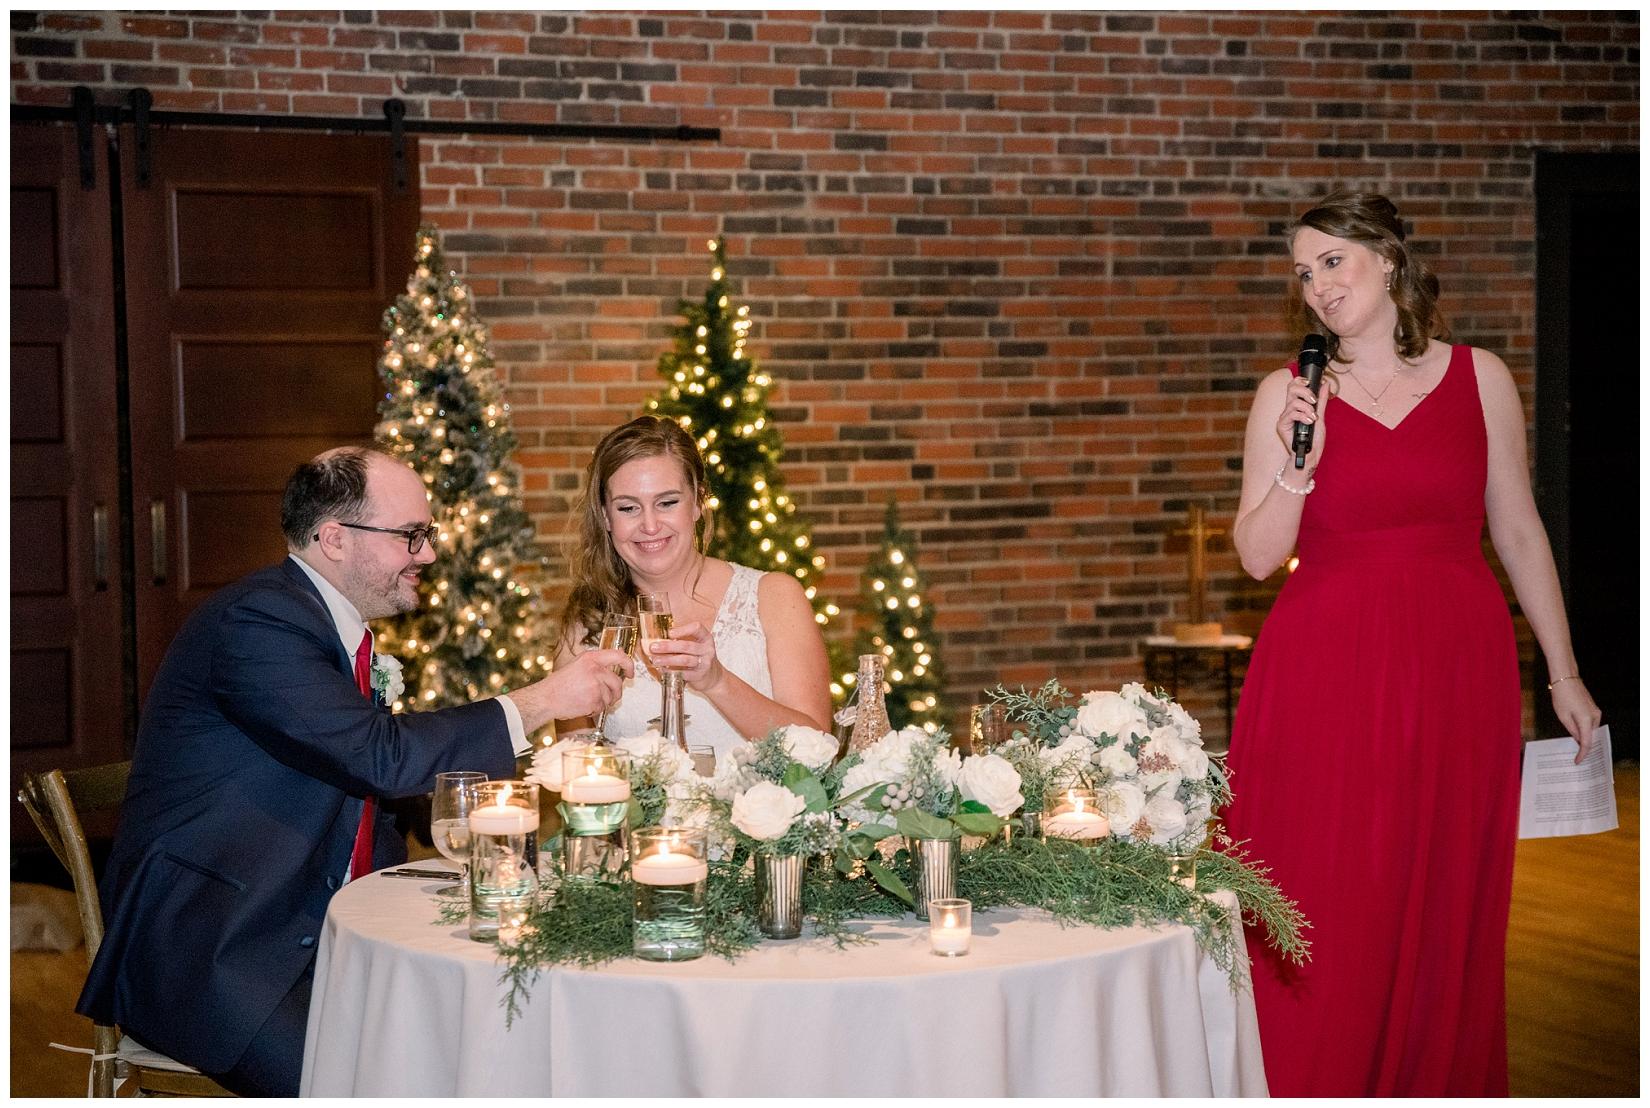 cat-alkire-wedding-photographer-indiana-chicago-indianapolis-fort-wayne_0995.jpg